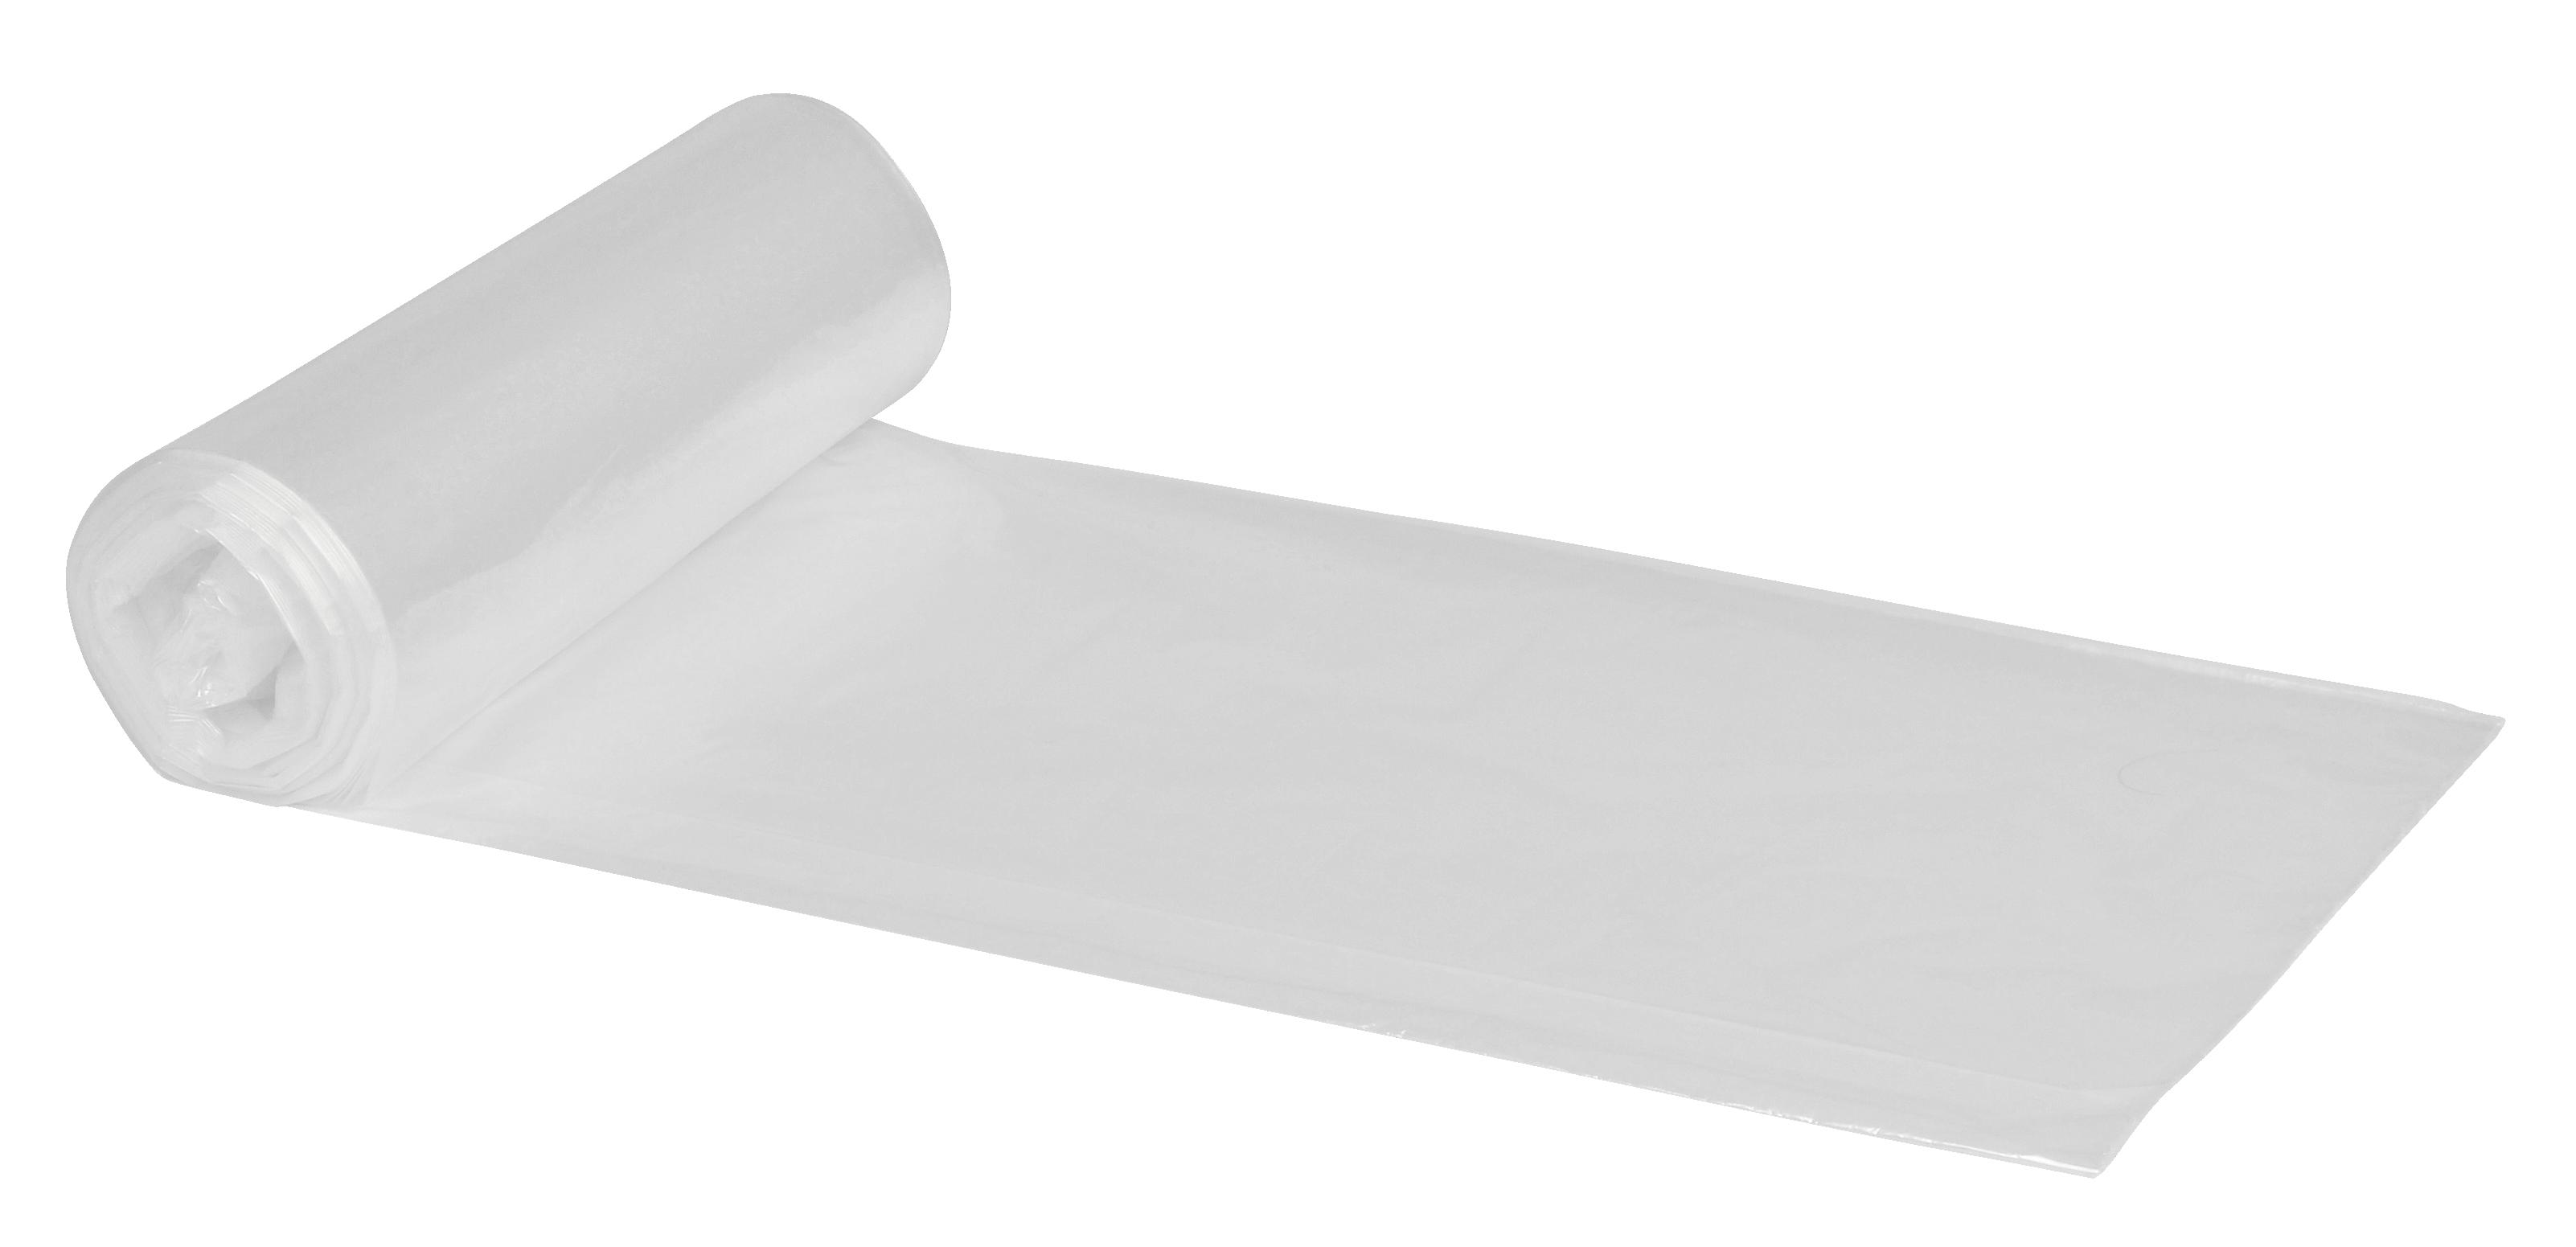 Poly-Line Müllbeutel, 15my, LDPE, 20 x 50 Stück, transparent, 60 x 70 cm/ 60 Liter